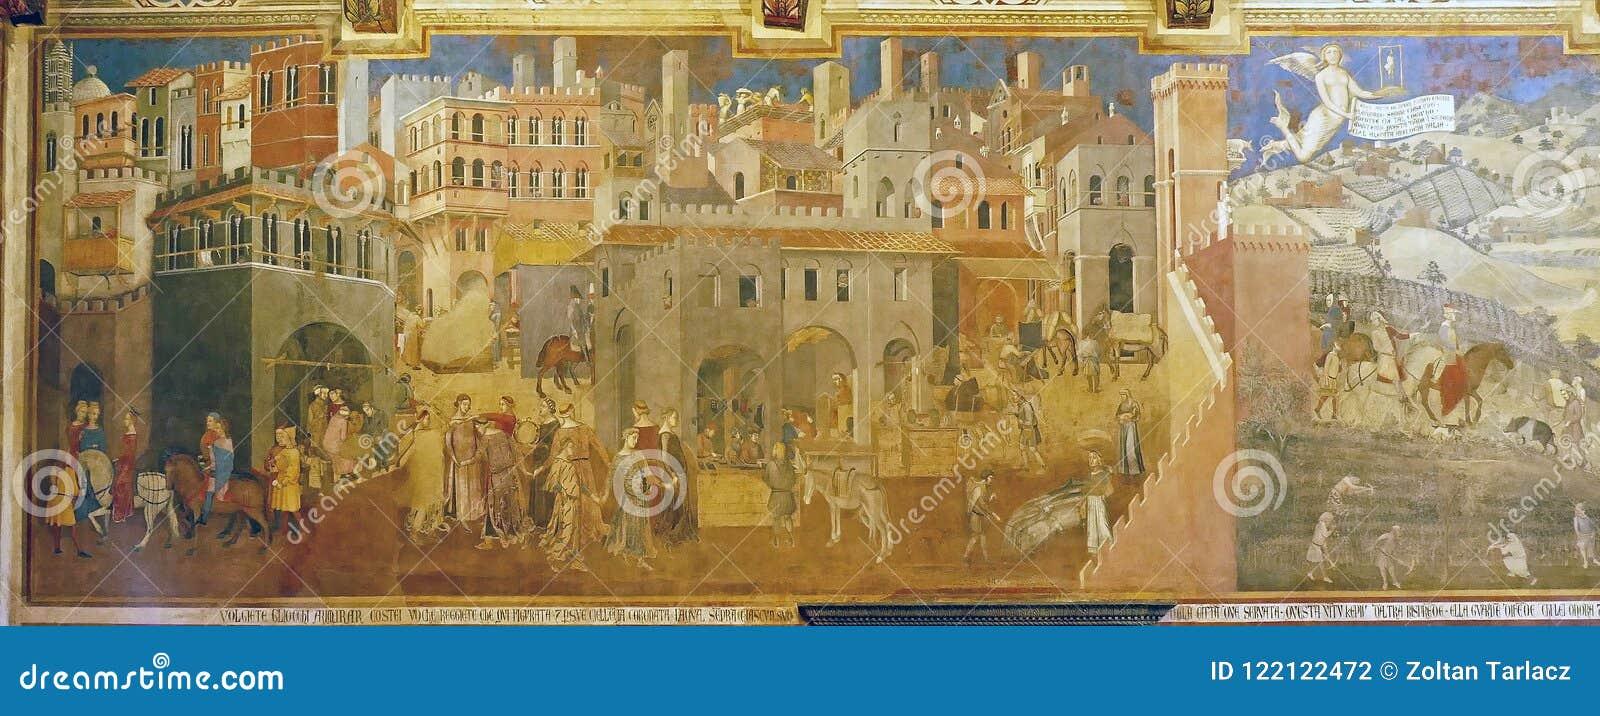 S And B Filters >> 好政府的原始的壁画`作用的照片对城市和Countr ` Ambrogio Lorenzetti 图库摄影片 - 图片 ...